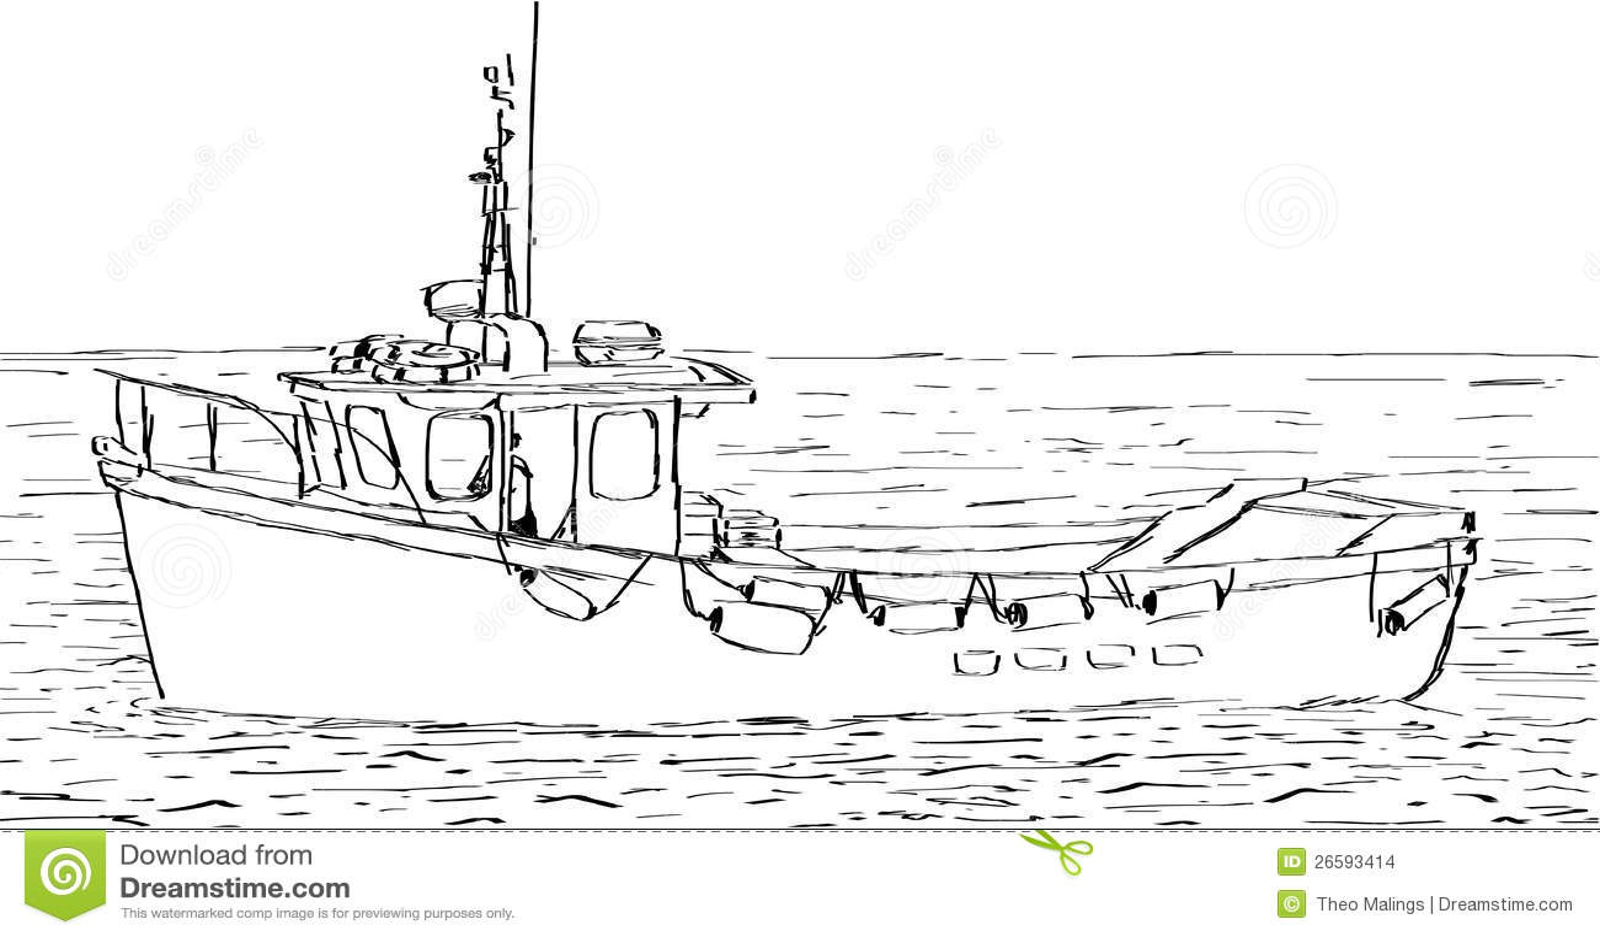 Boat Sketch stock vector. Illustration of boating, water - 26593414